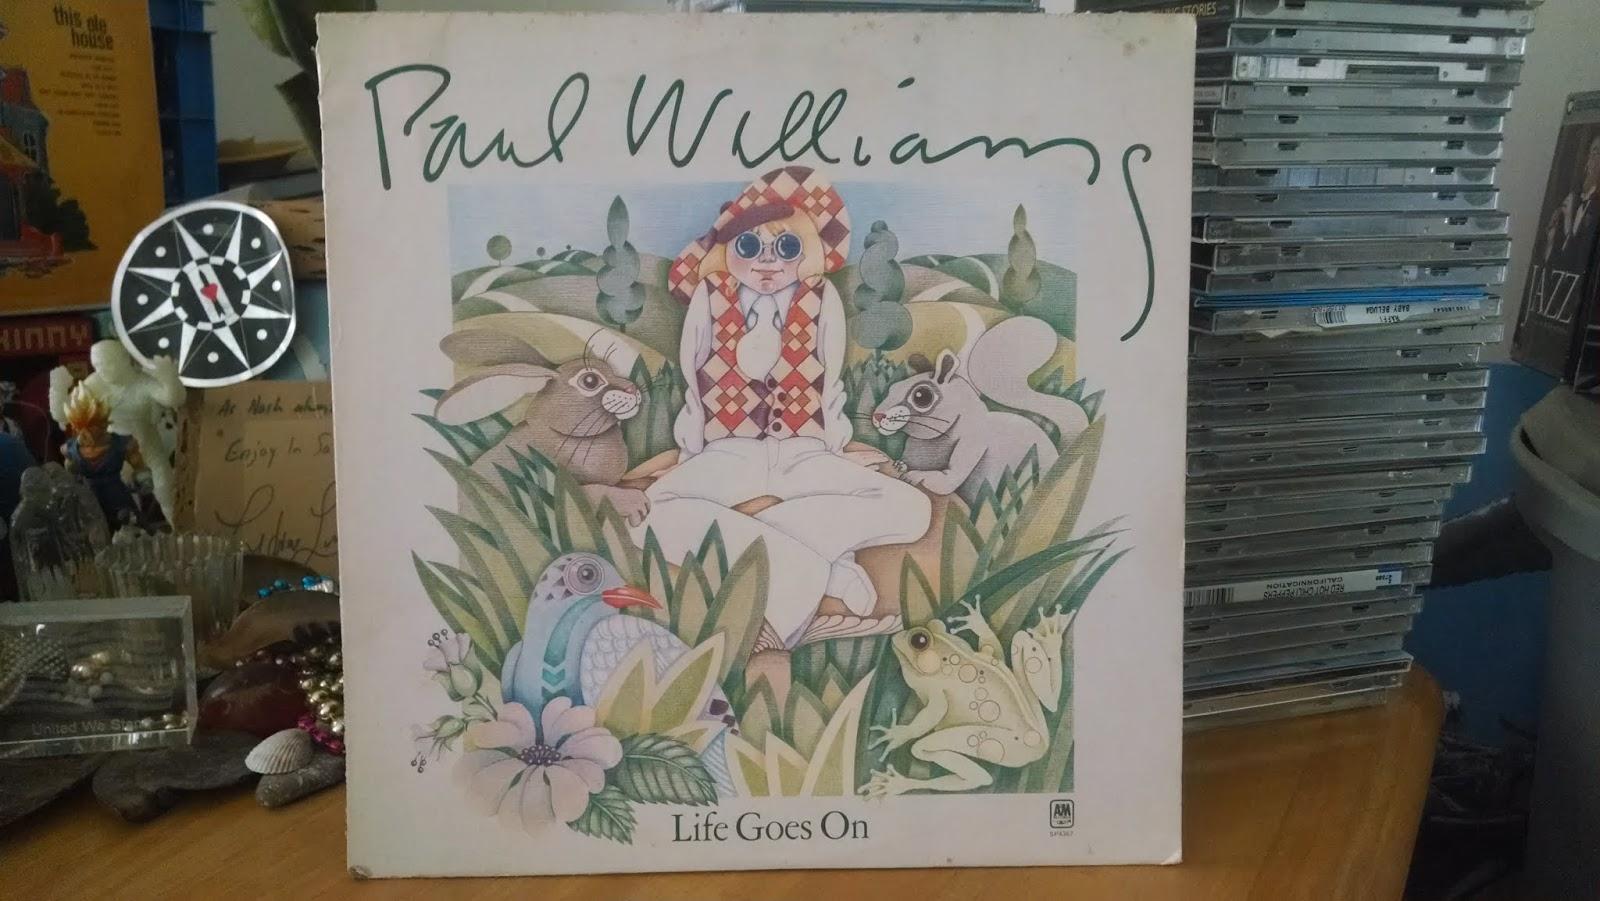 DOWN UNDERGROUND: Paul Williams - Life Goes On LP 72